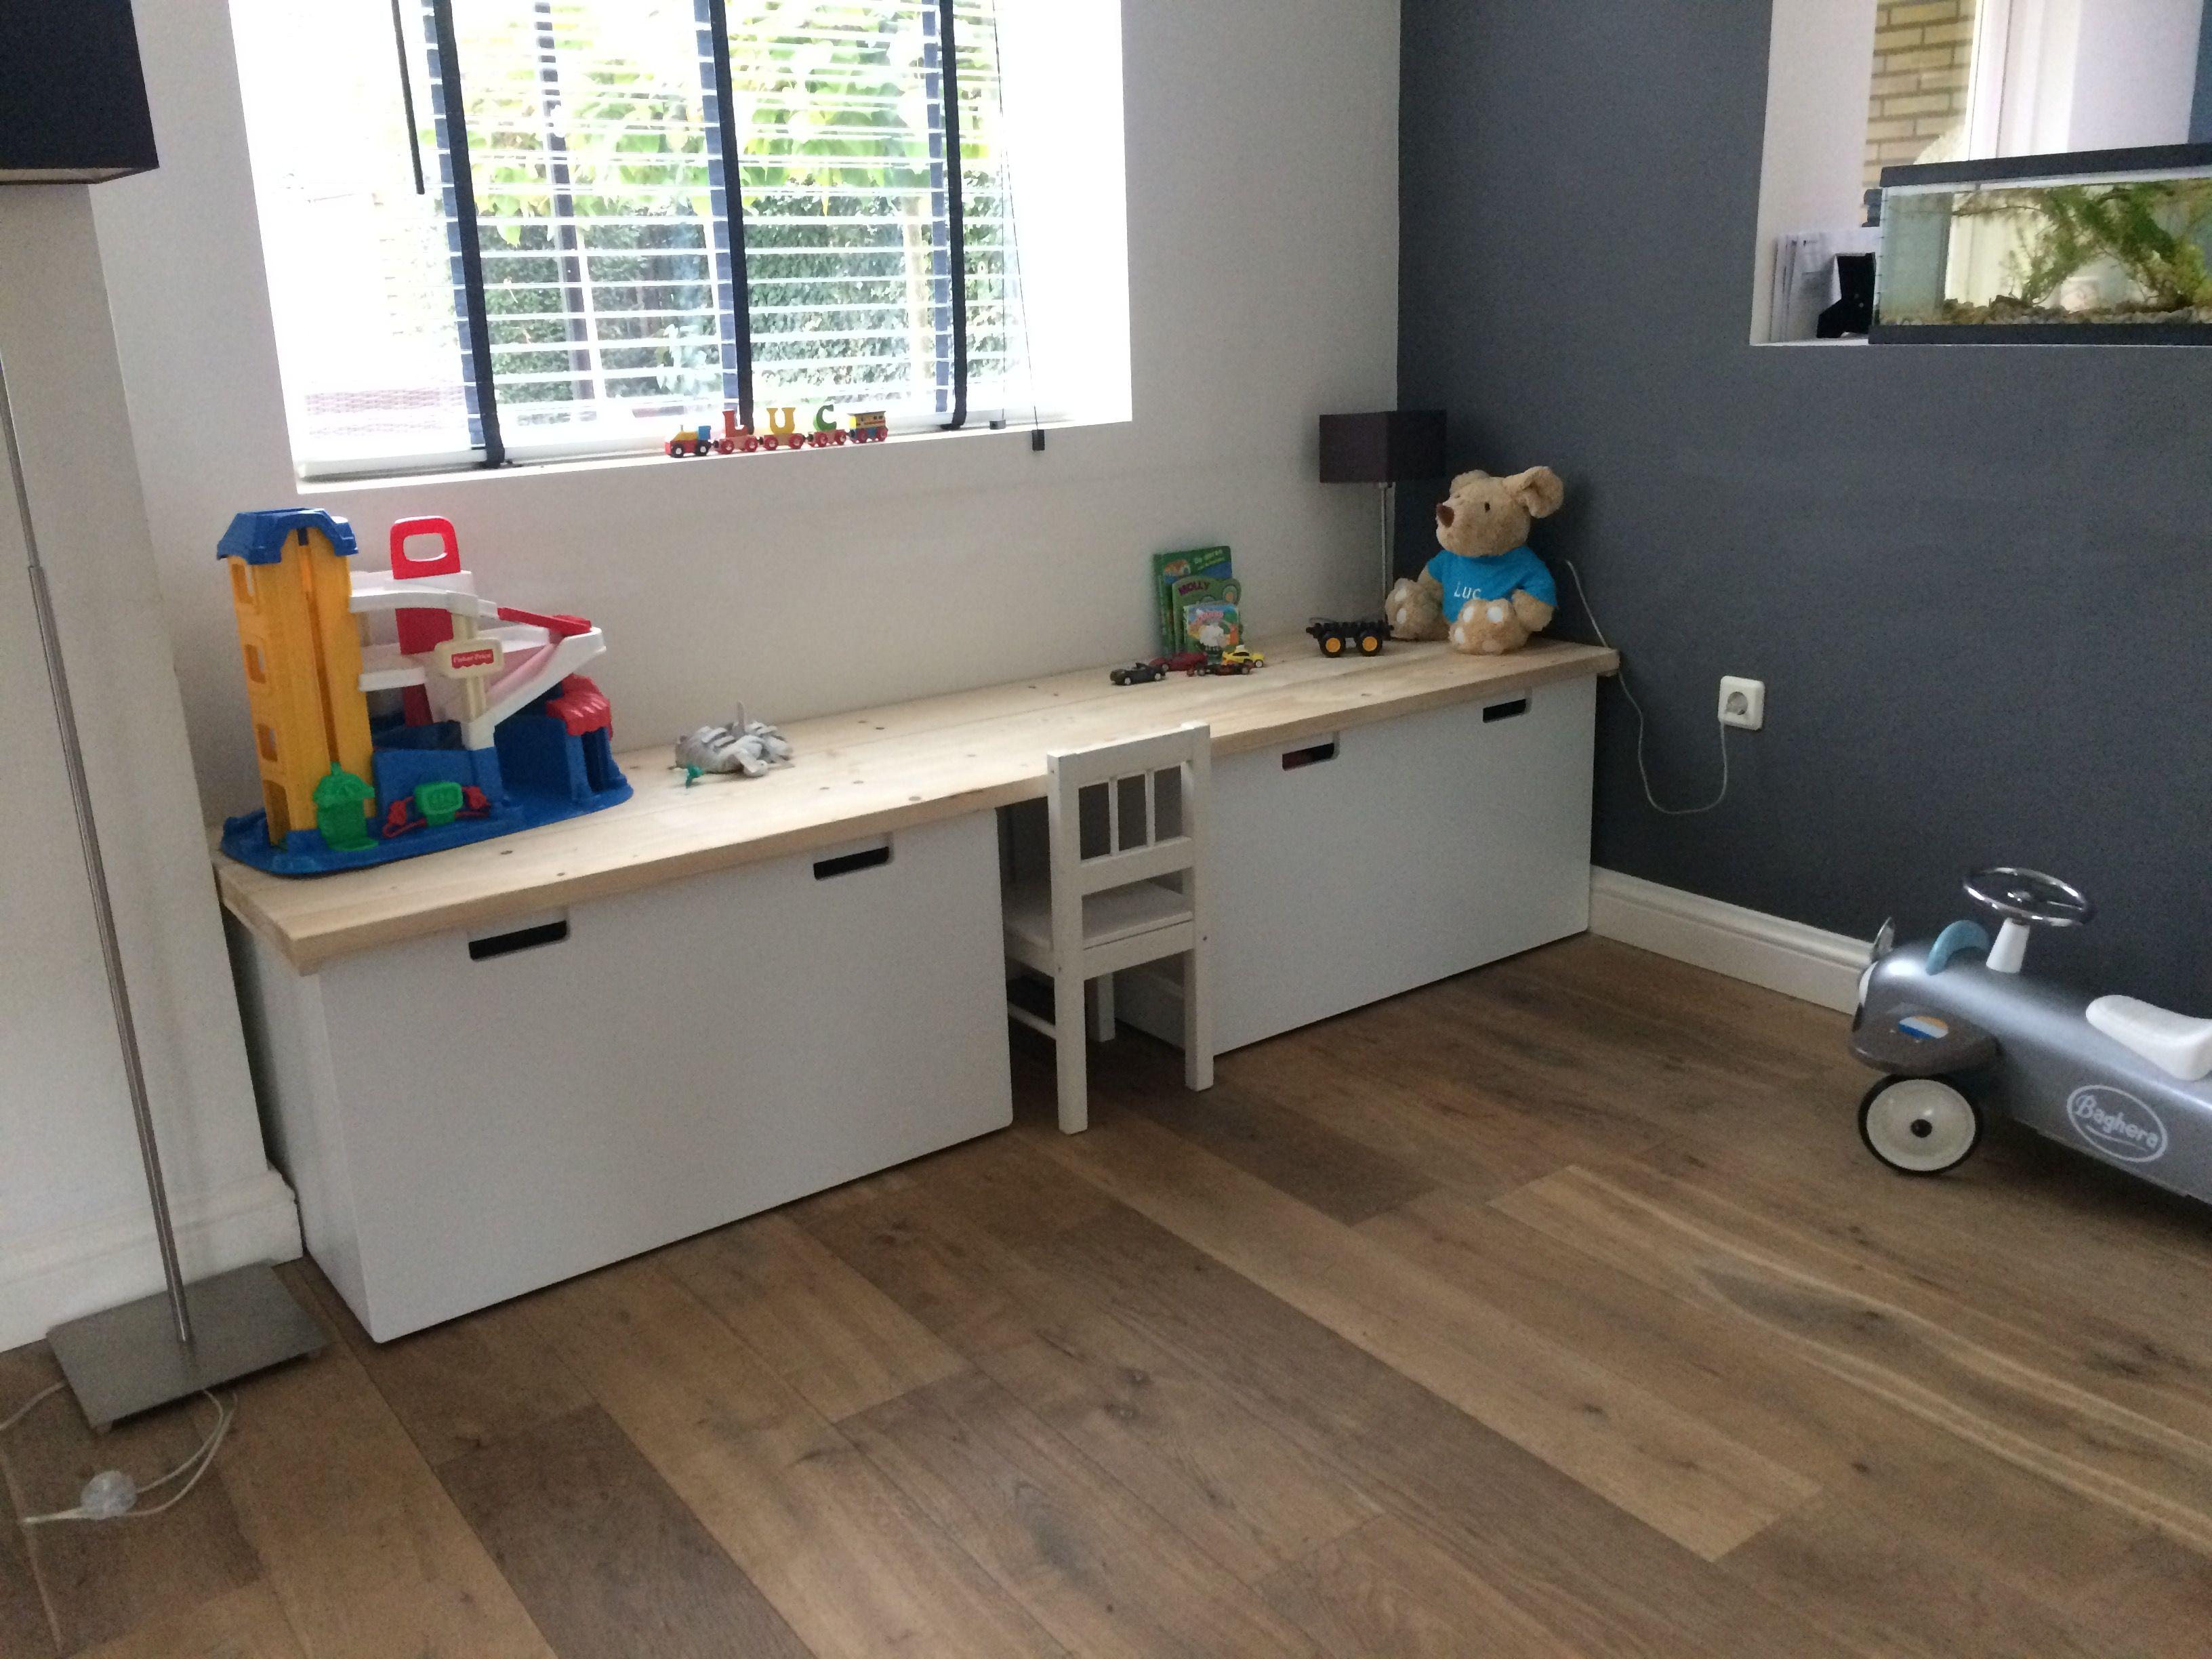 Ikea speelhoek woonkamer | Interieur | Pinterest